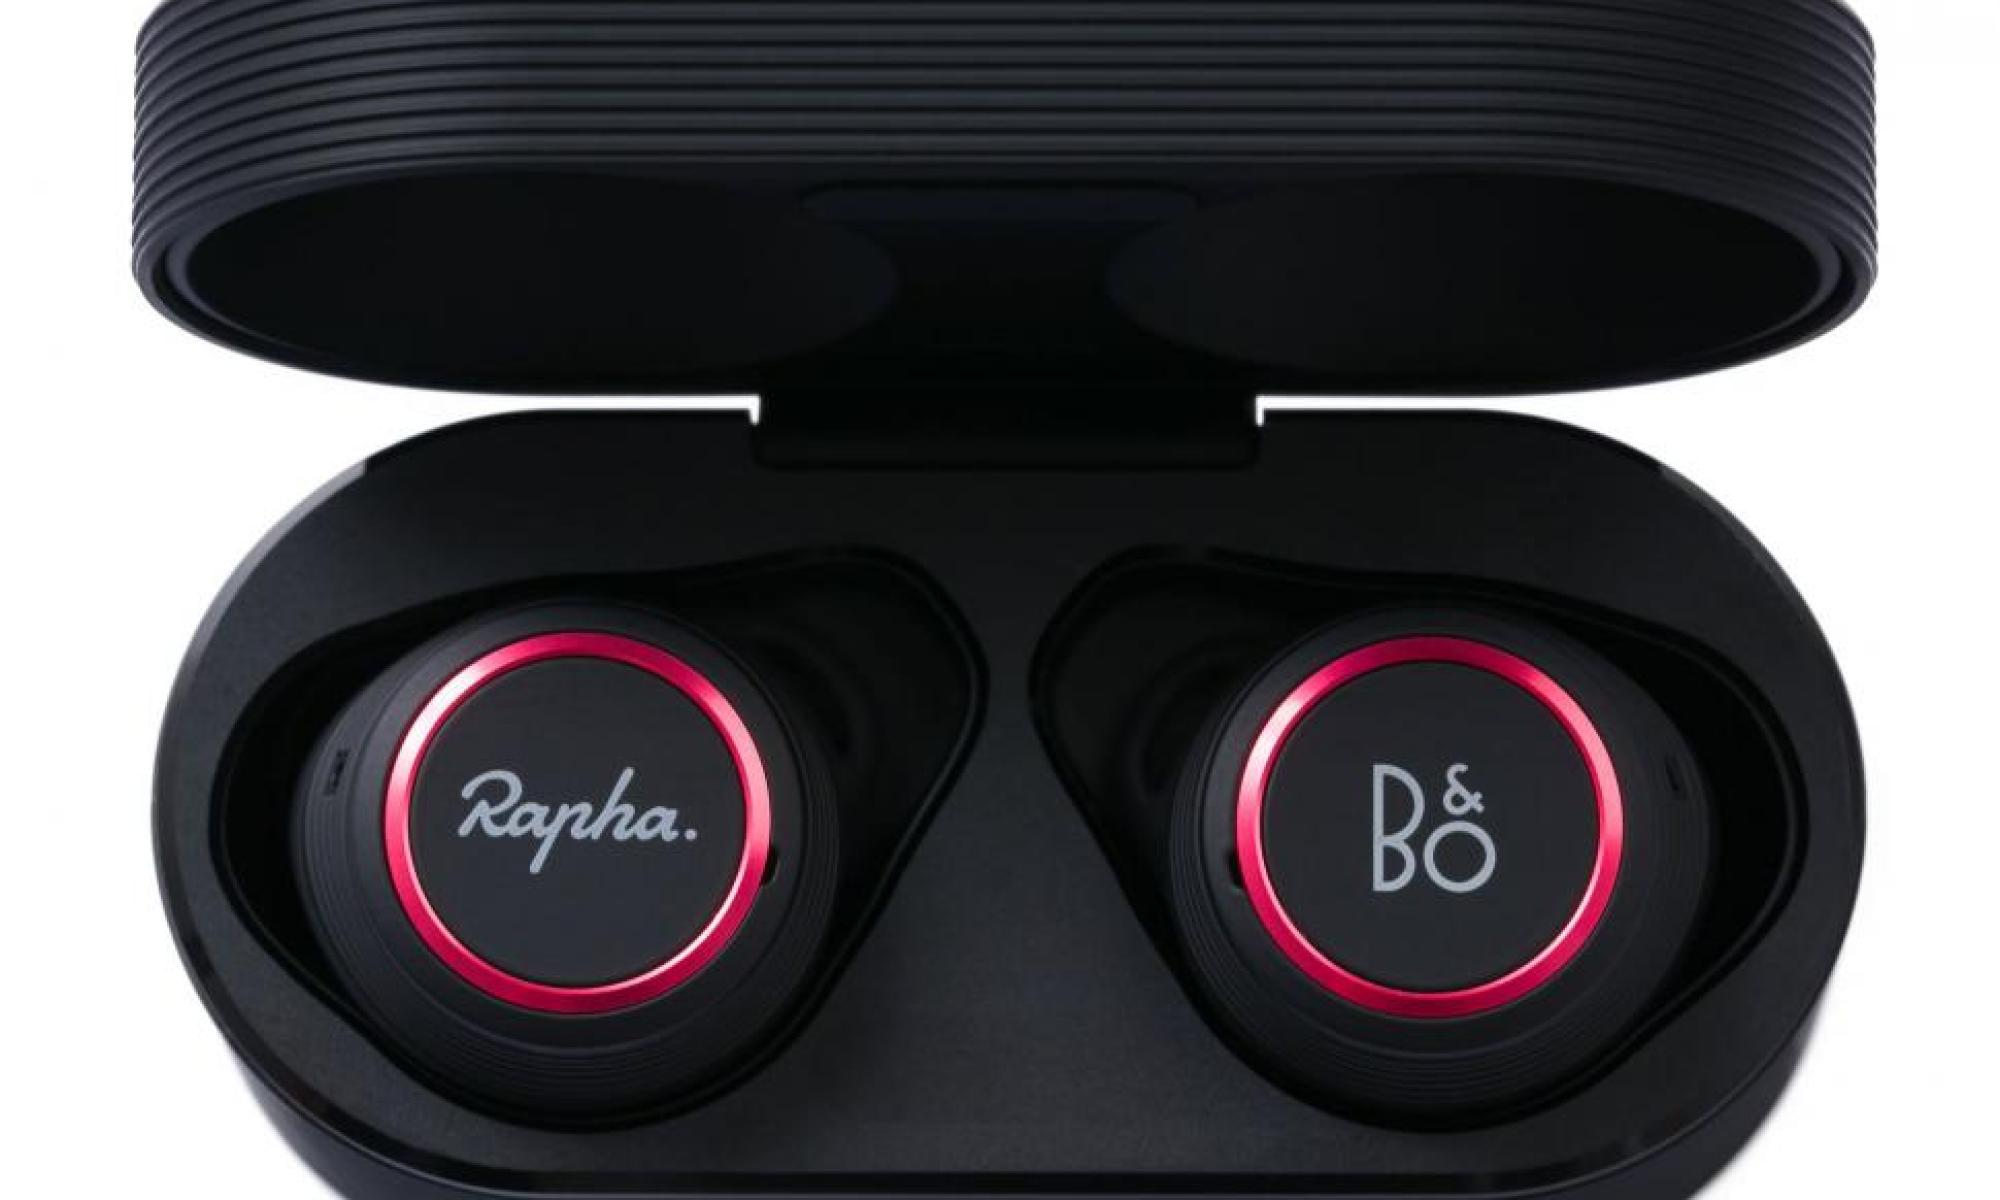 Rapha collaborates with Bang & Olufsen on Bluetooth earphones